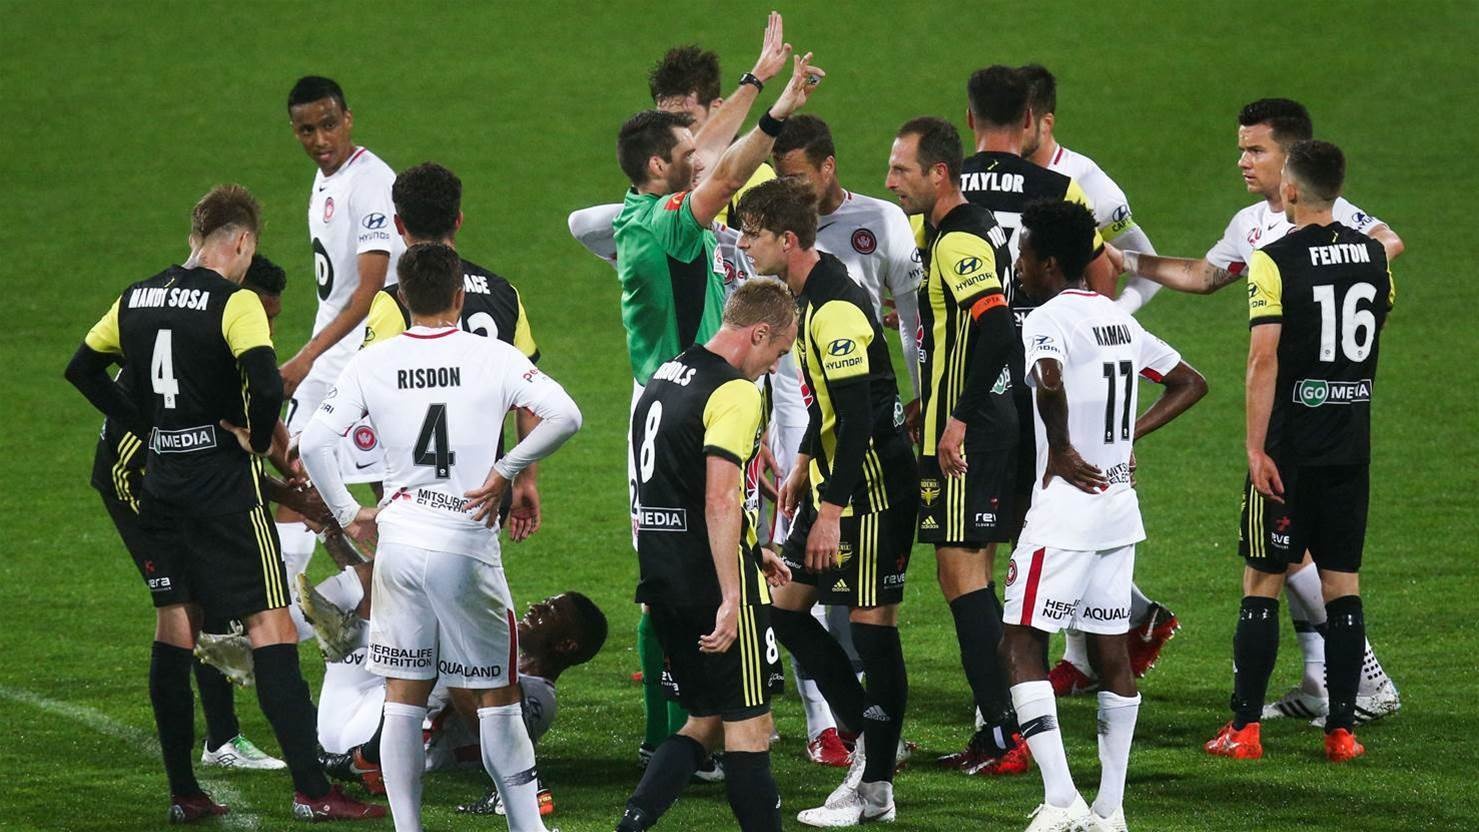 Wellington Phoenix v Western Sydney Wanderers player ratings